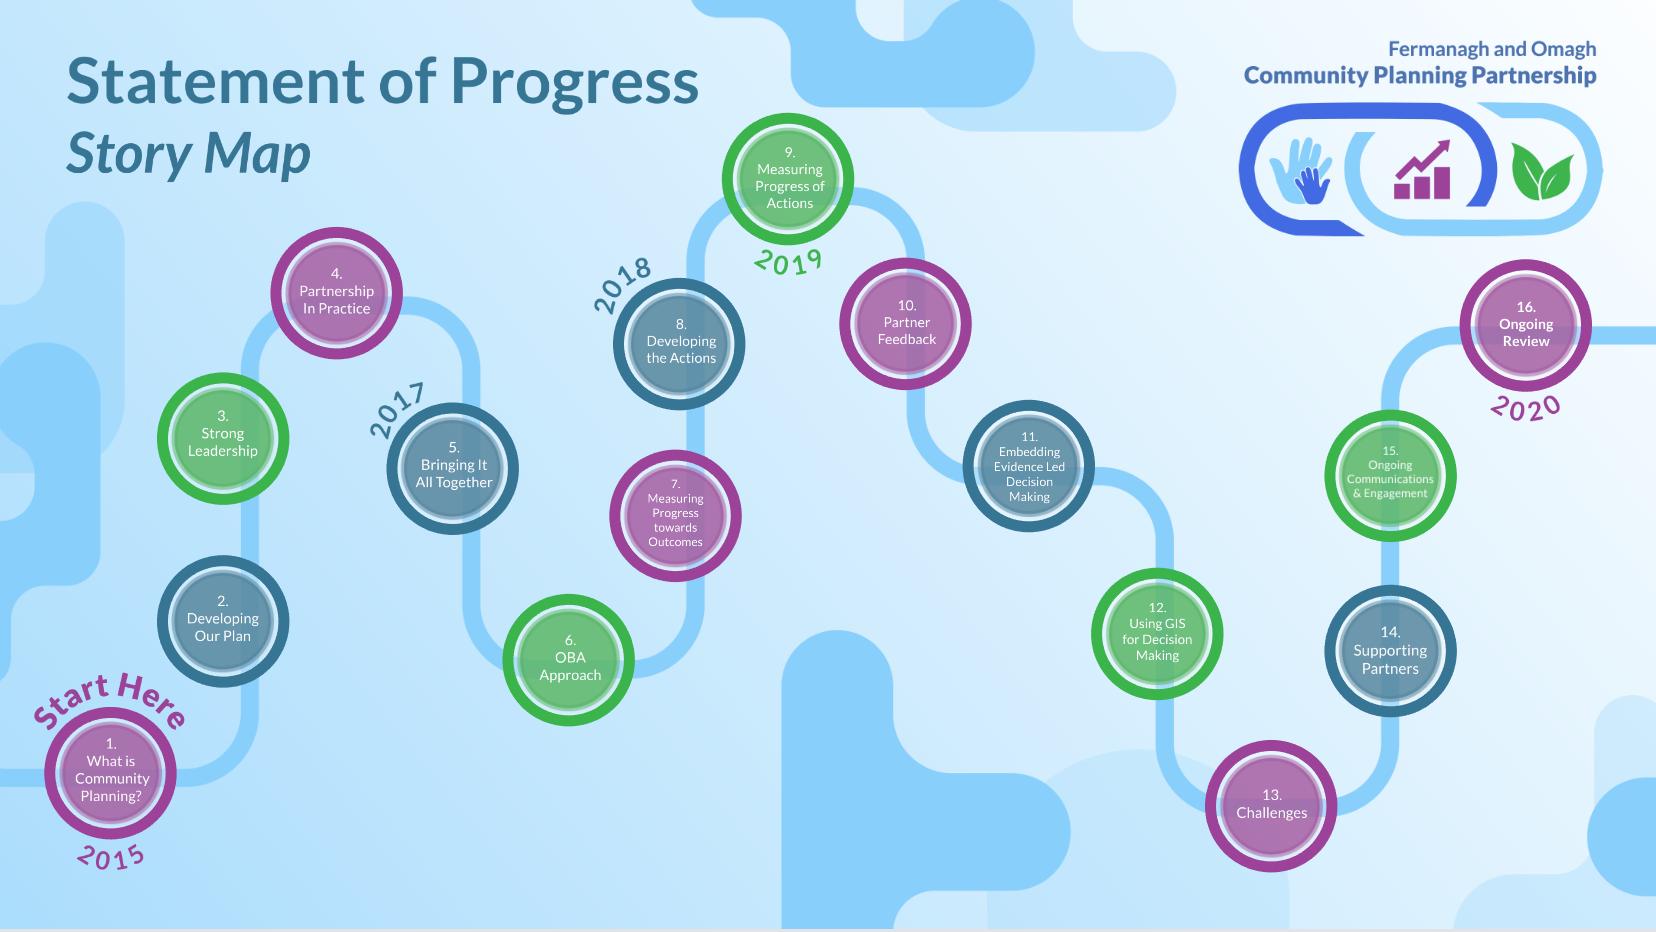 Statement of Progress